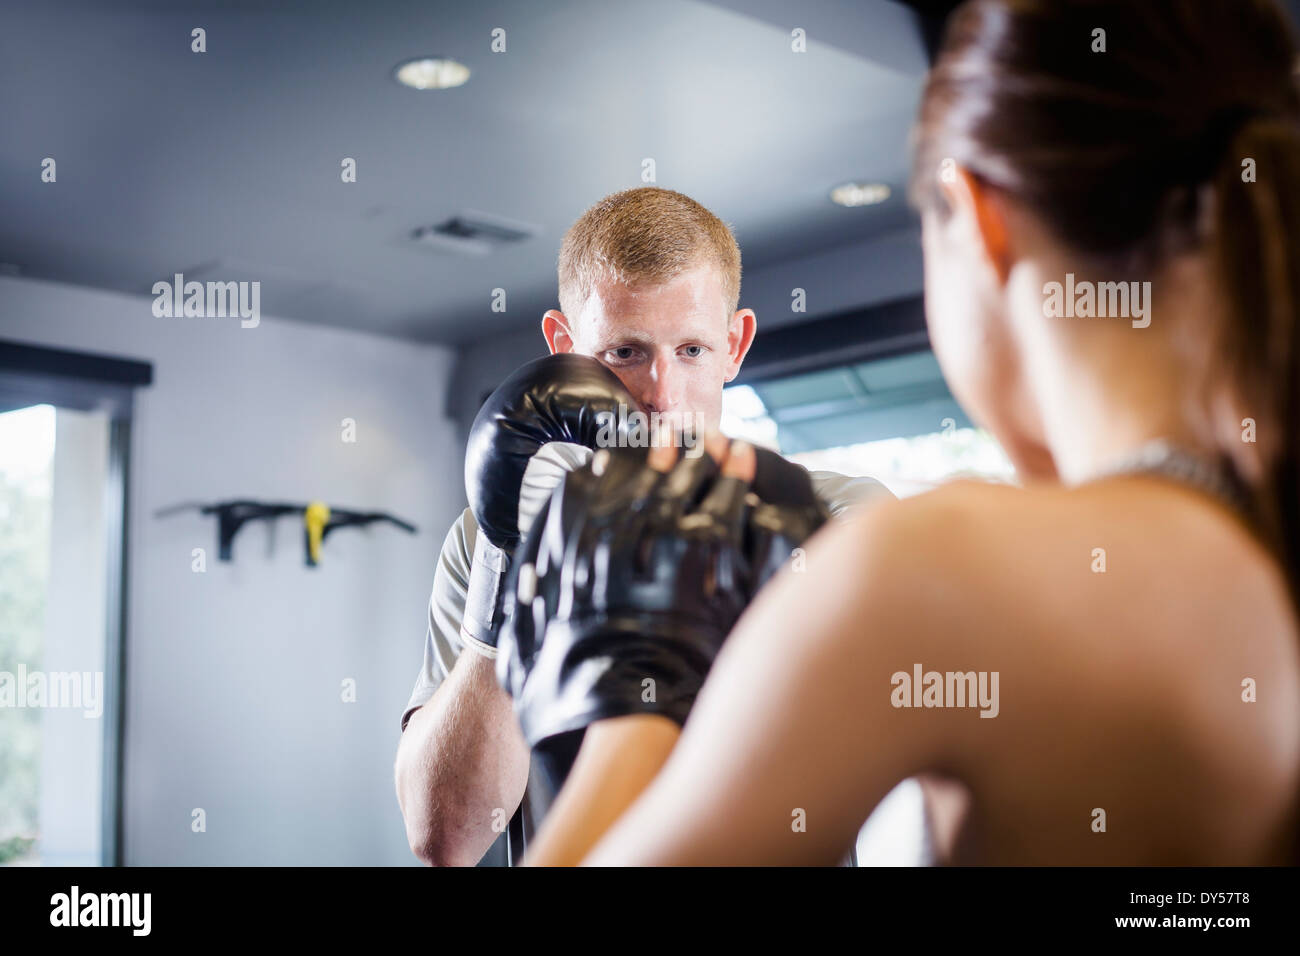 Kickboxing en formación Imagen De Stock